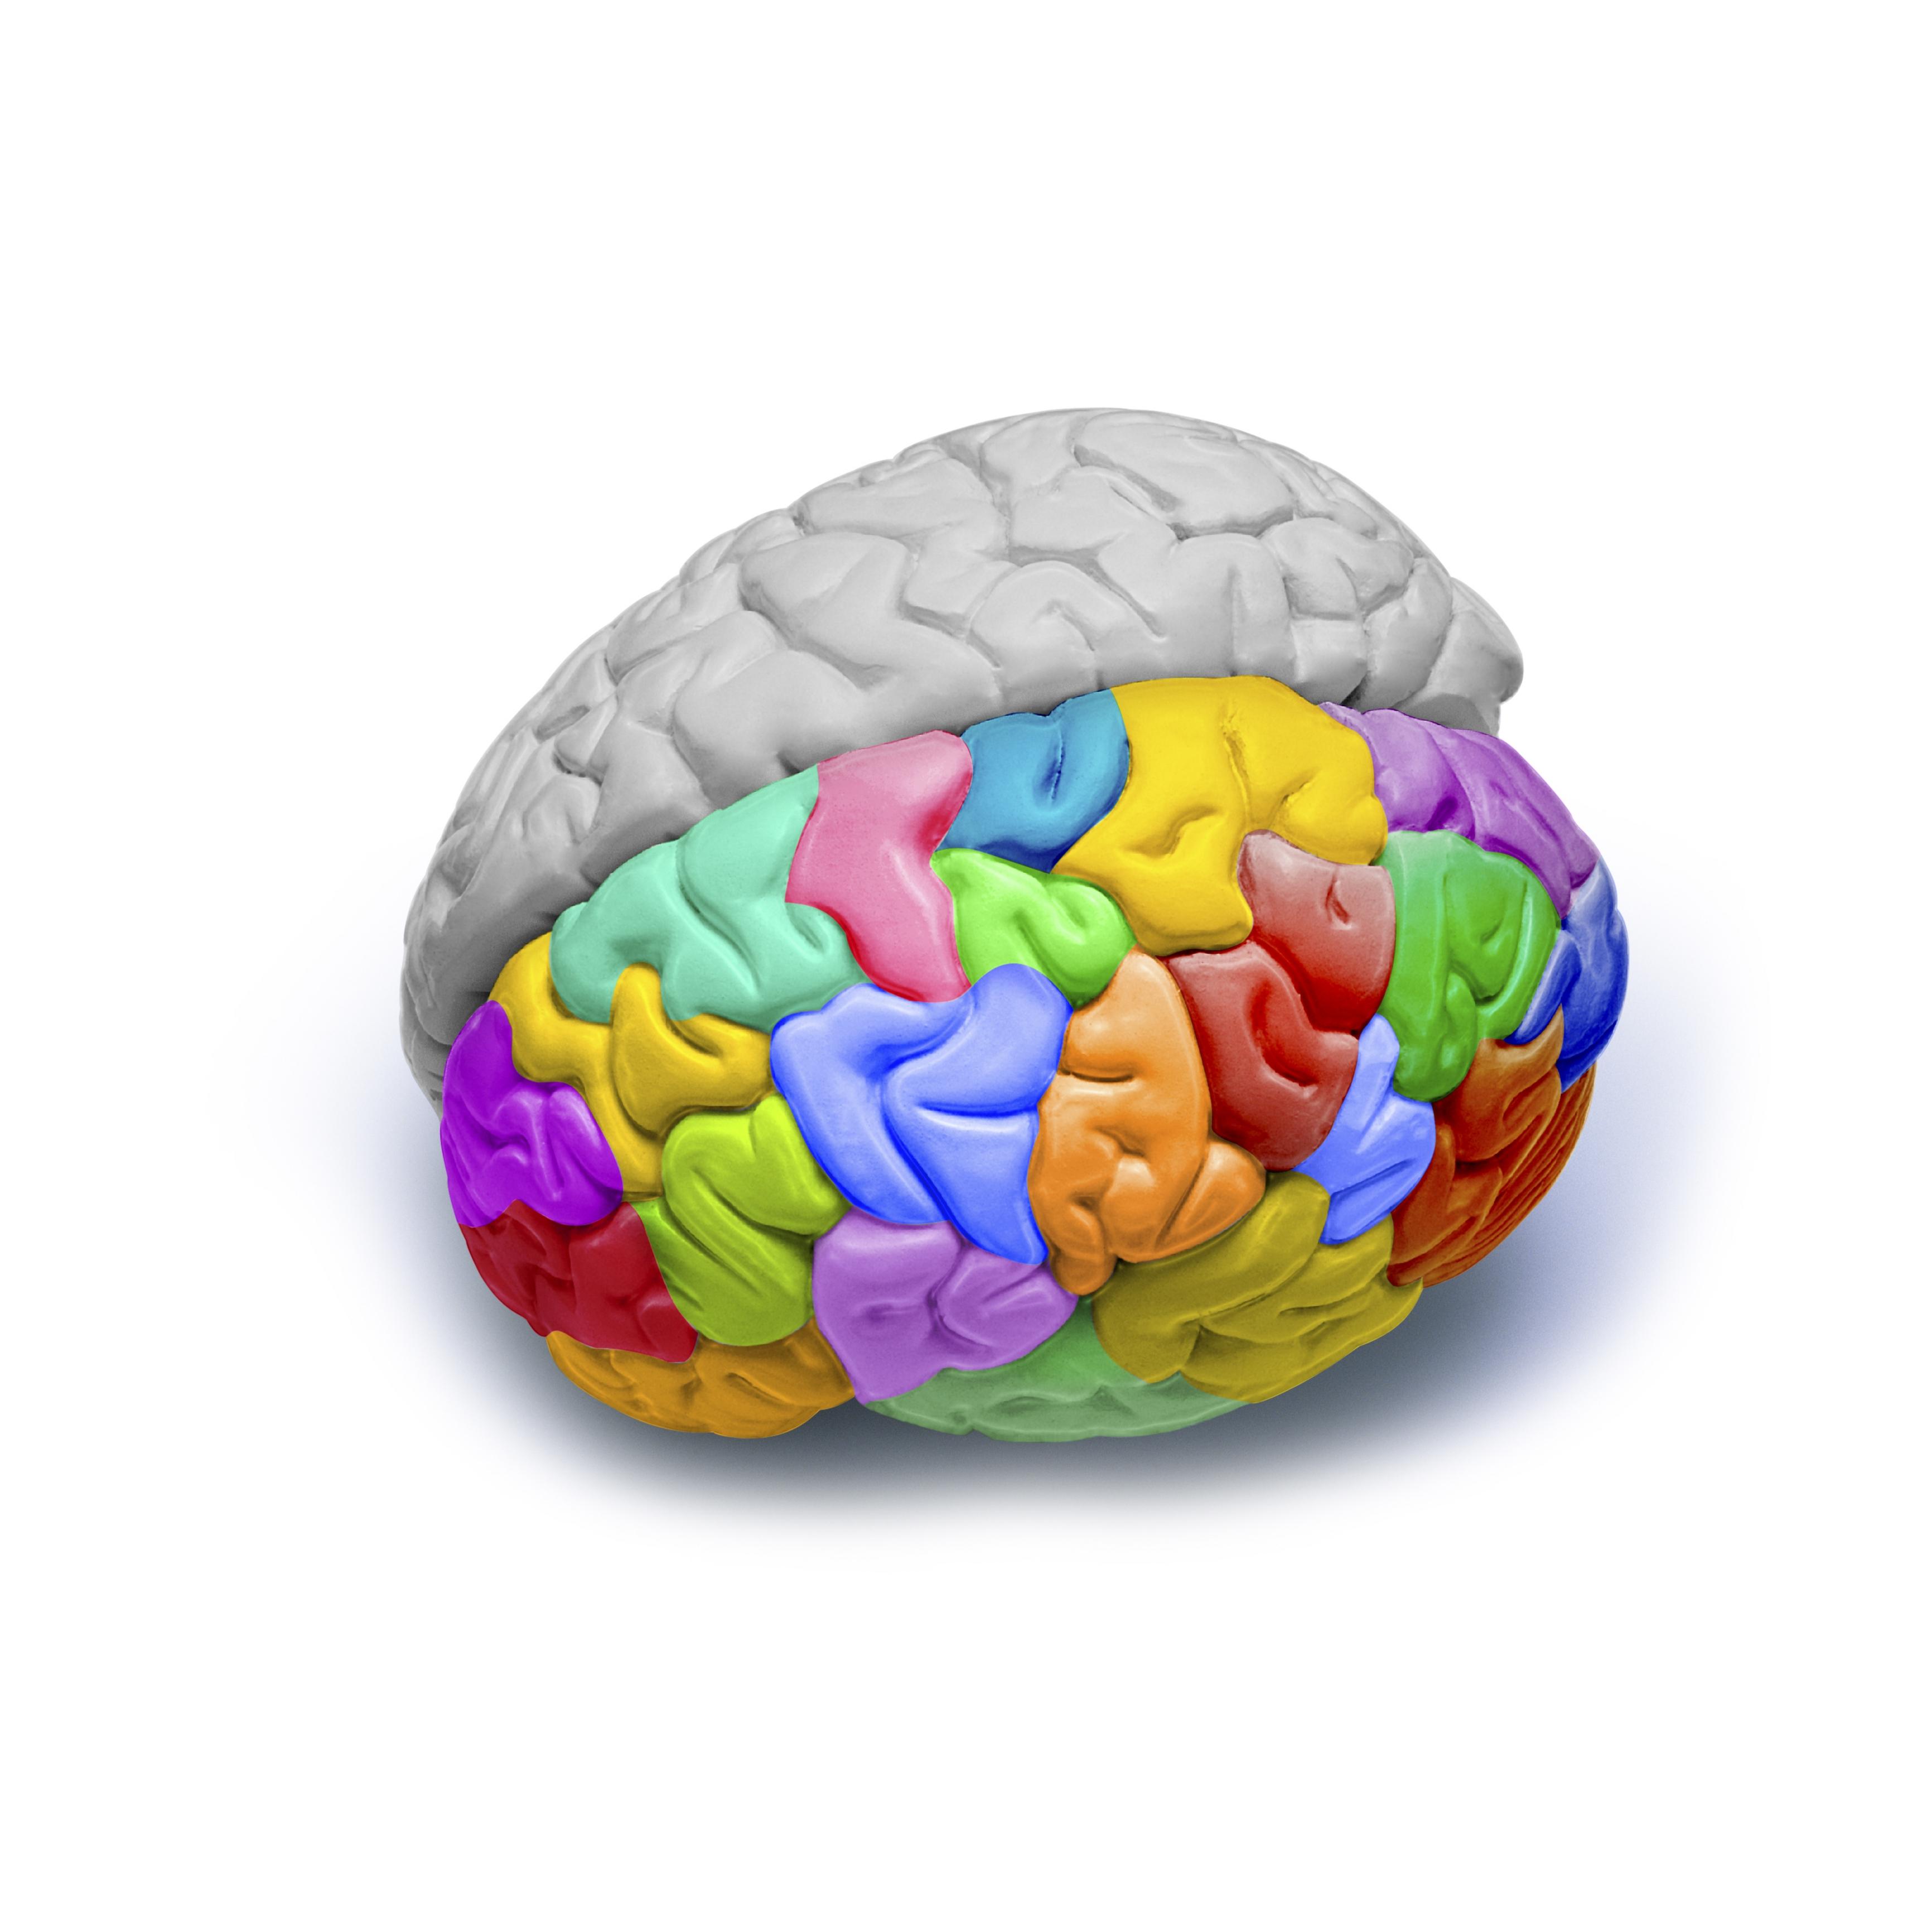 creierul responsabil de vedere